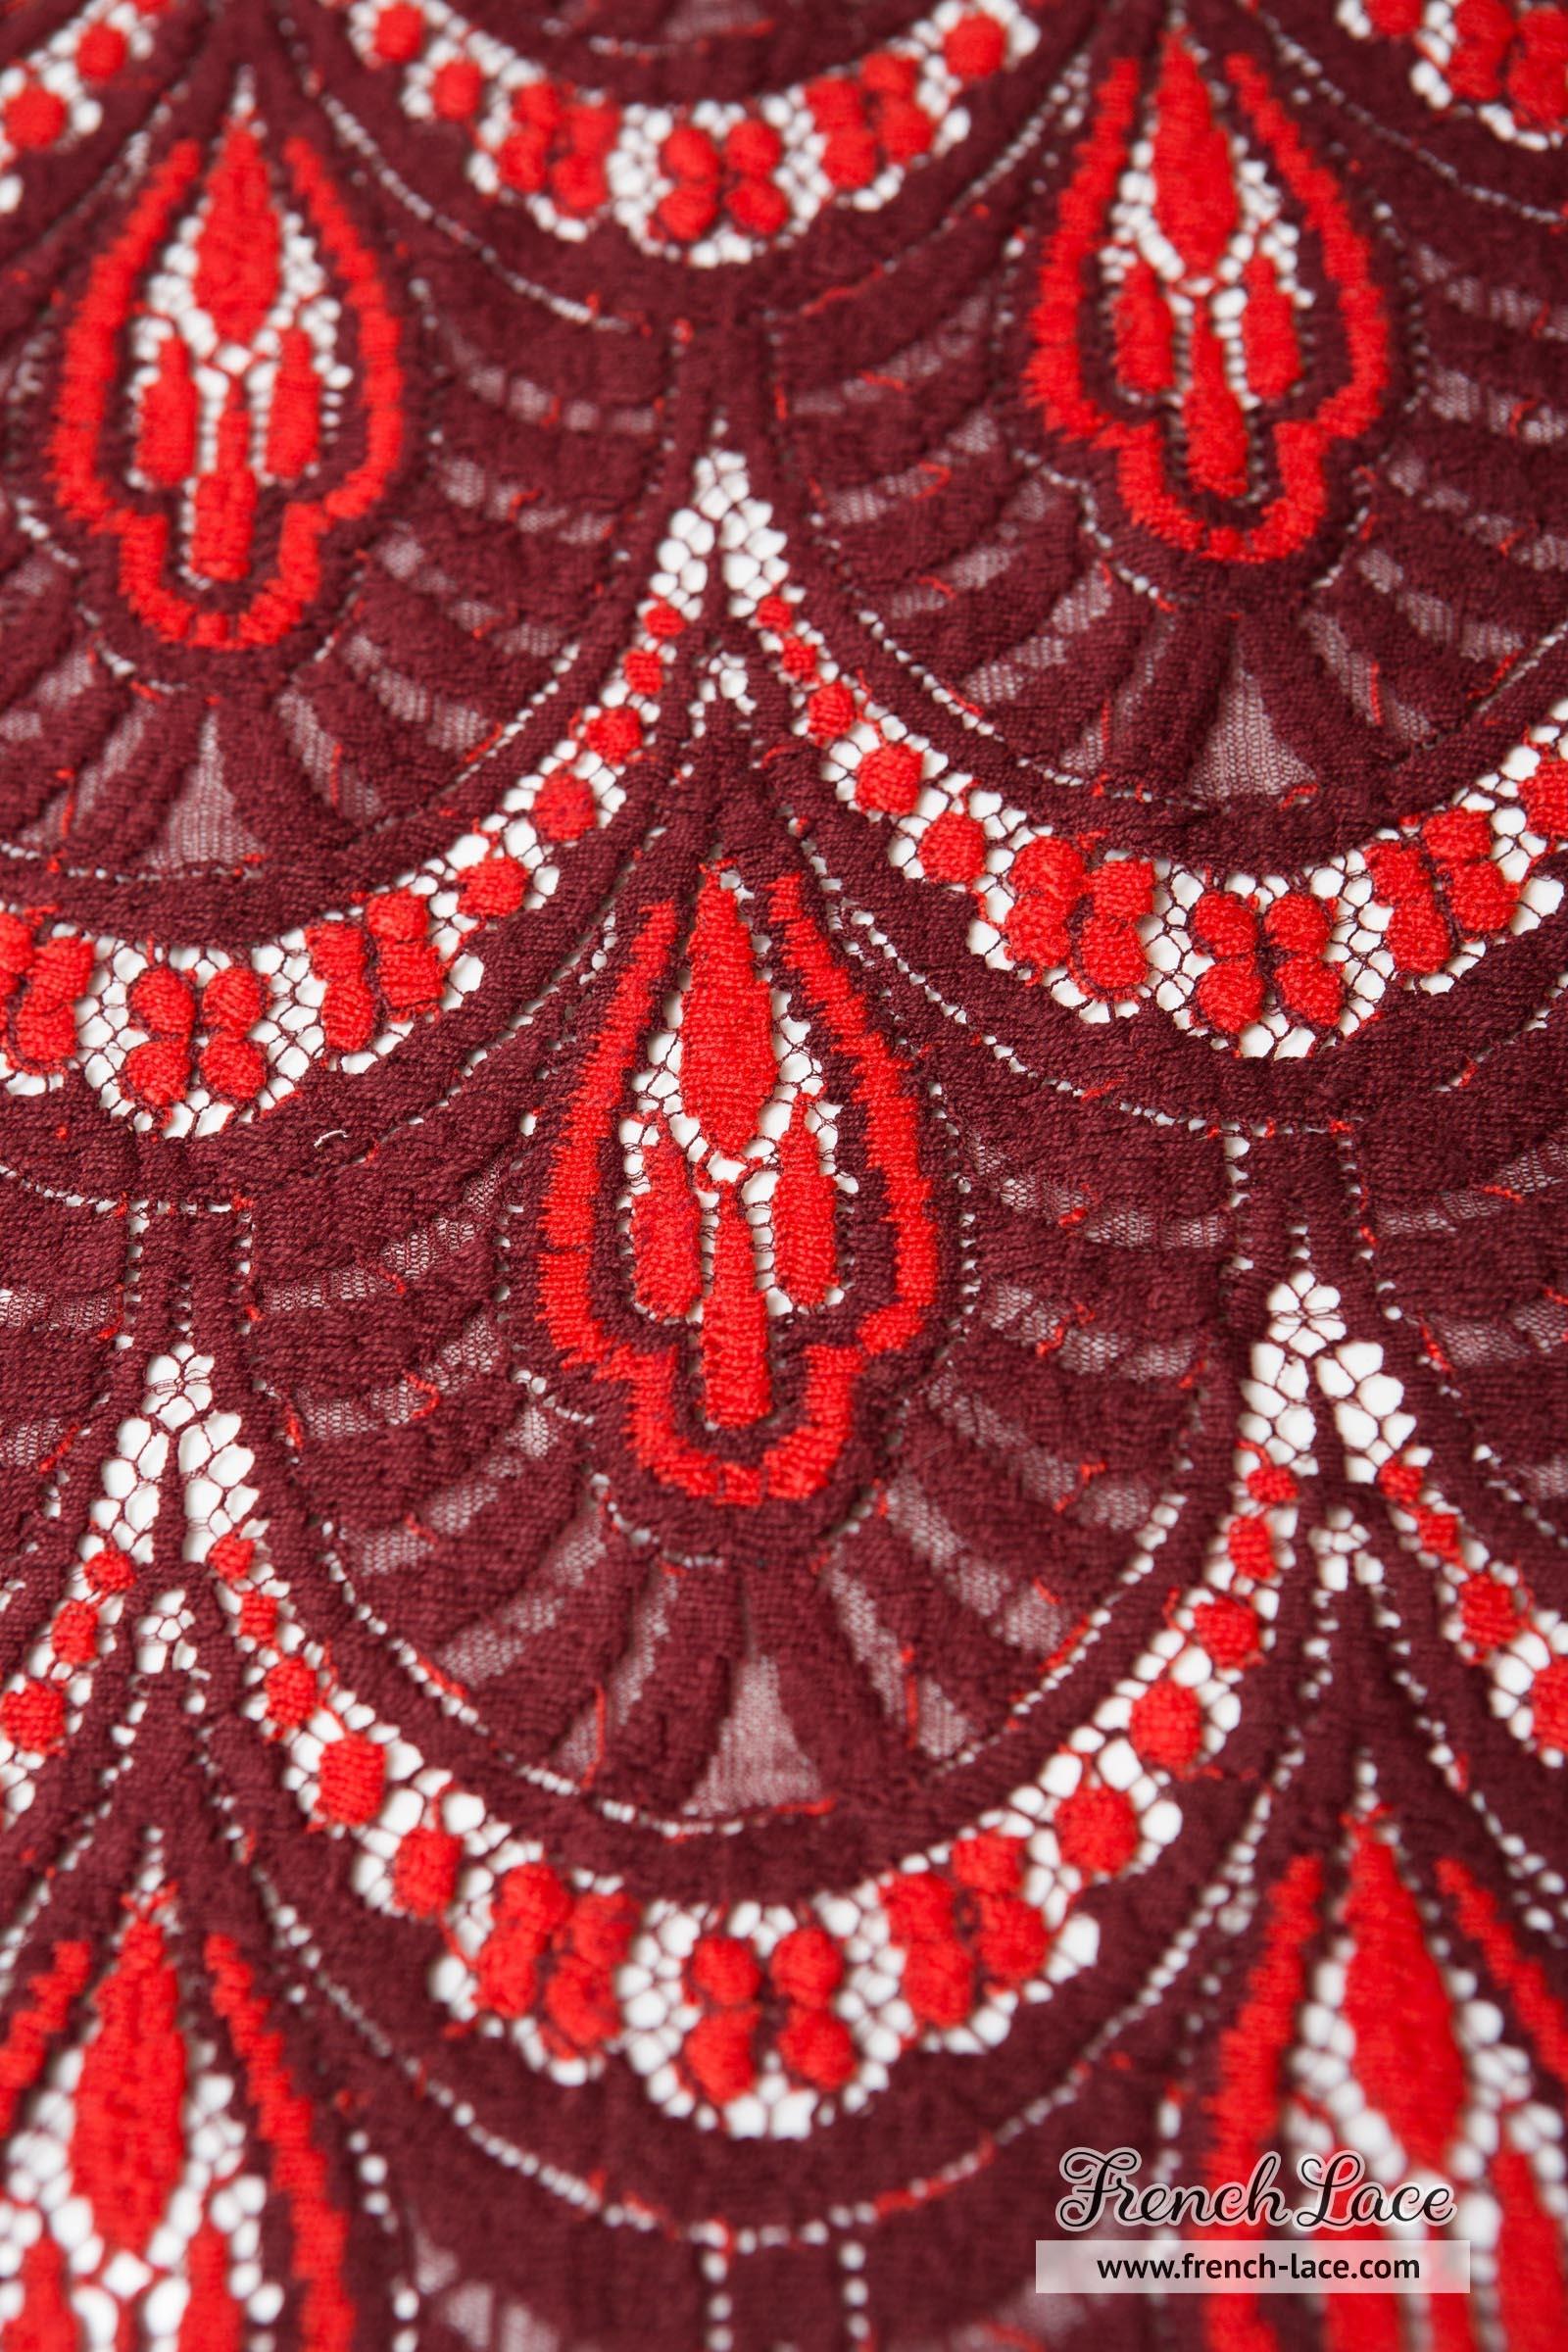 cayla 100 red bordeaux french lace online shop. Black Bedroom Furniture Sets. Home Design Ideas